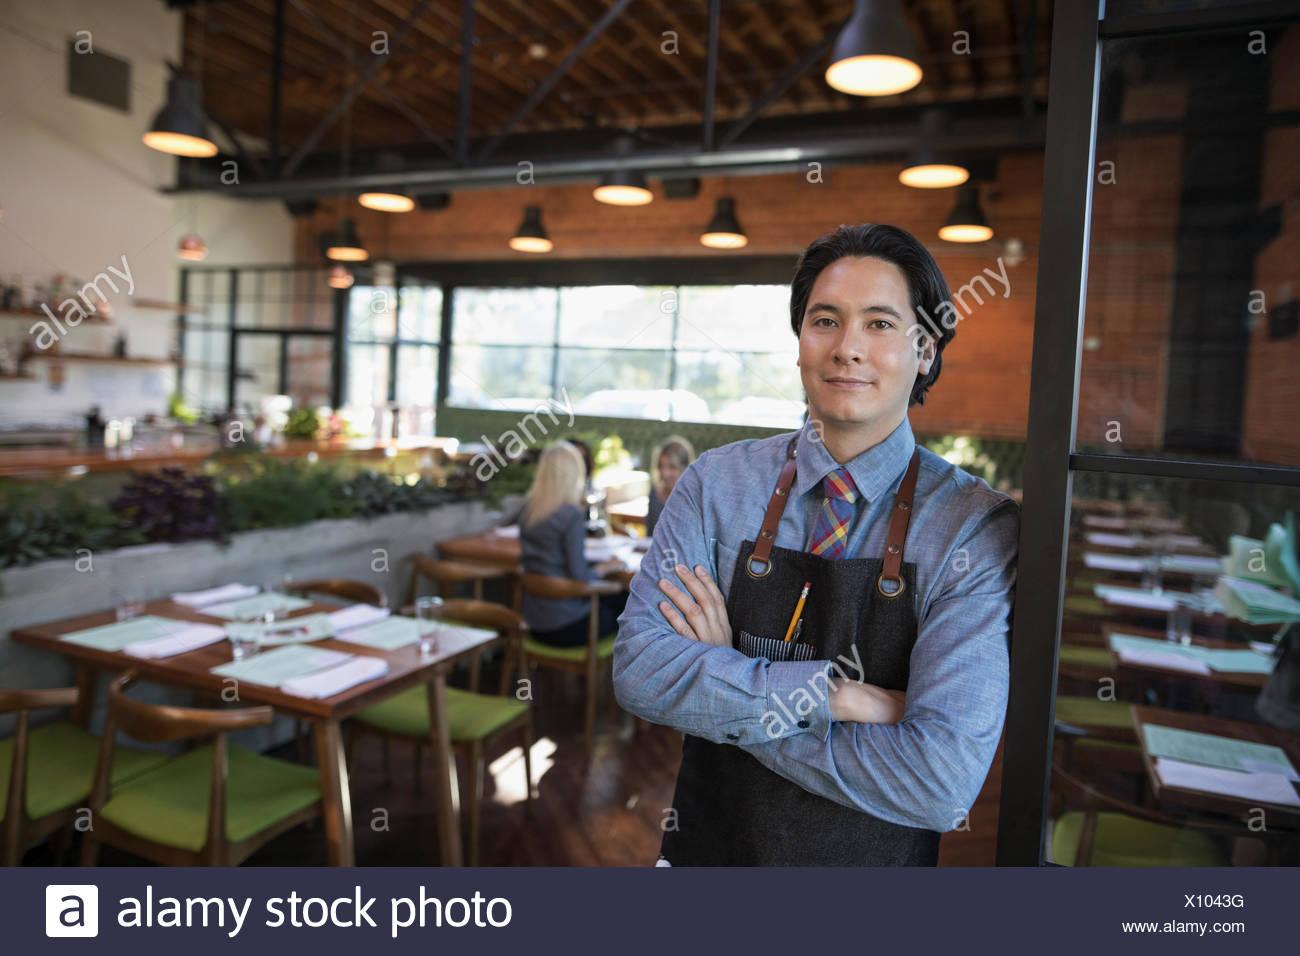 Portrait homme confiant server in restaurant Photo Stock